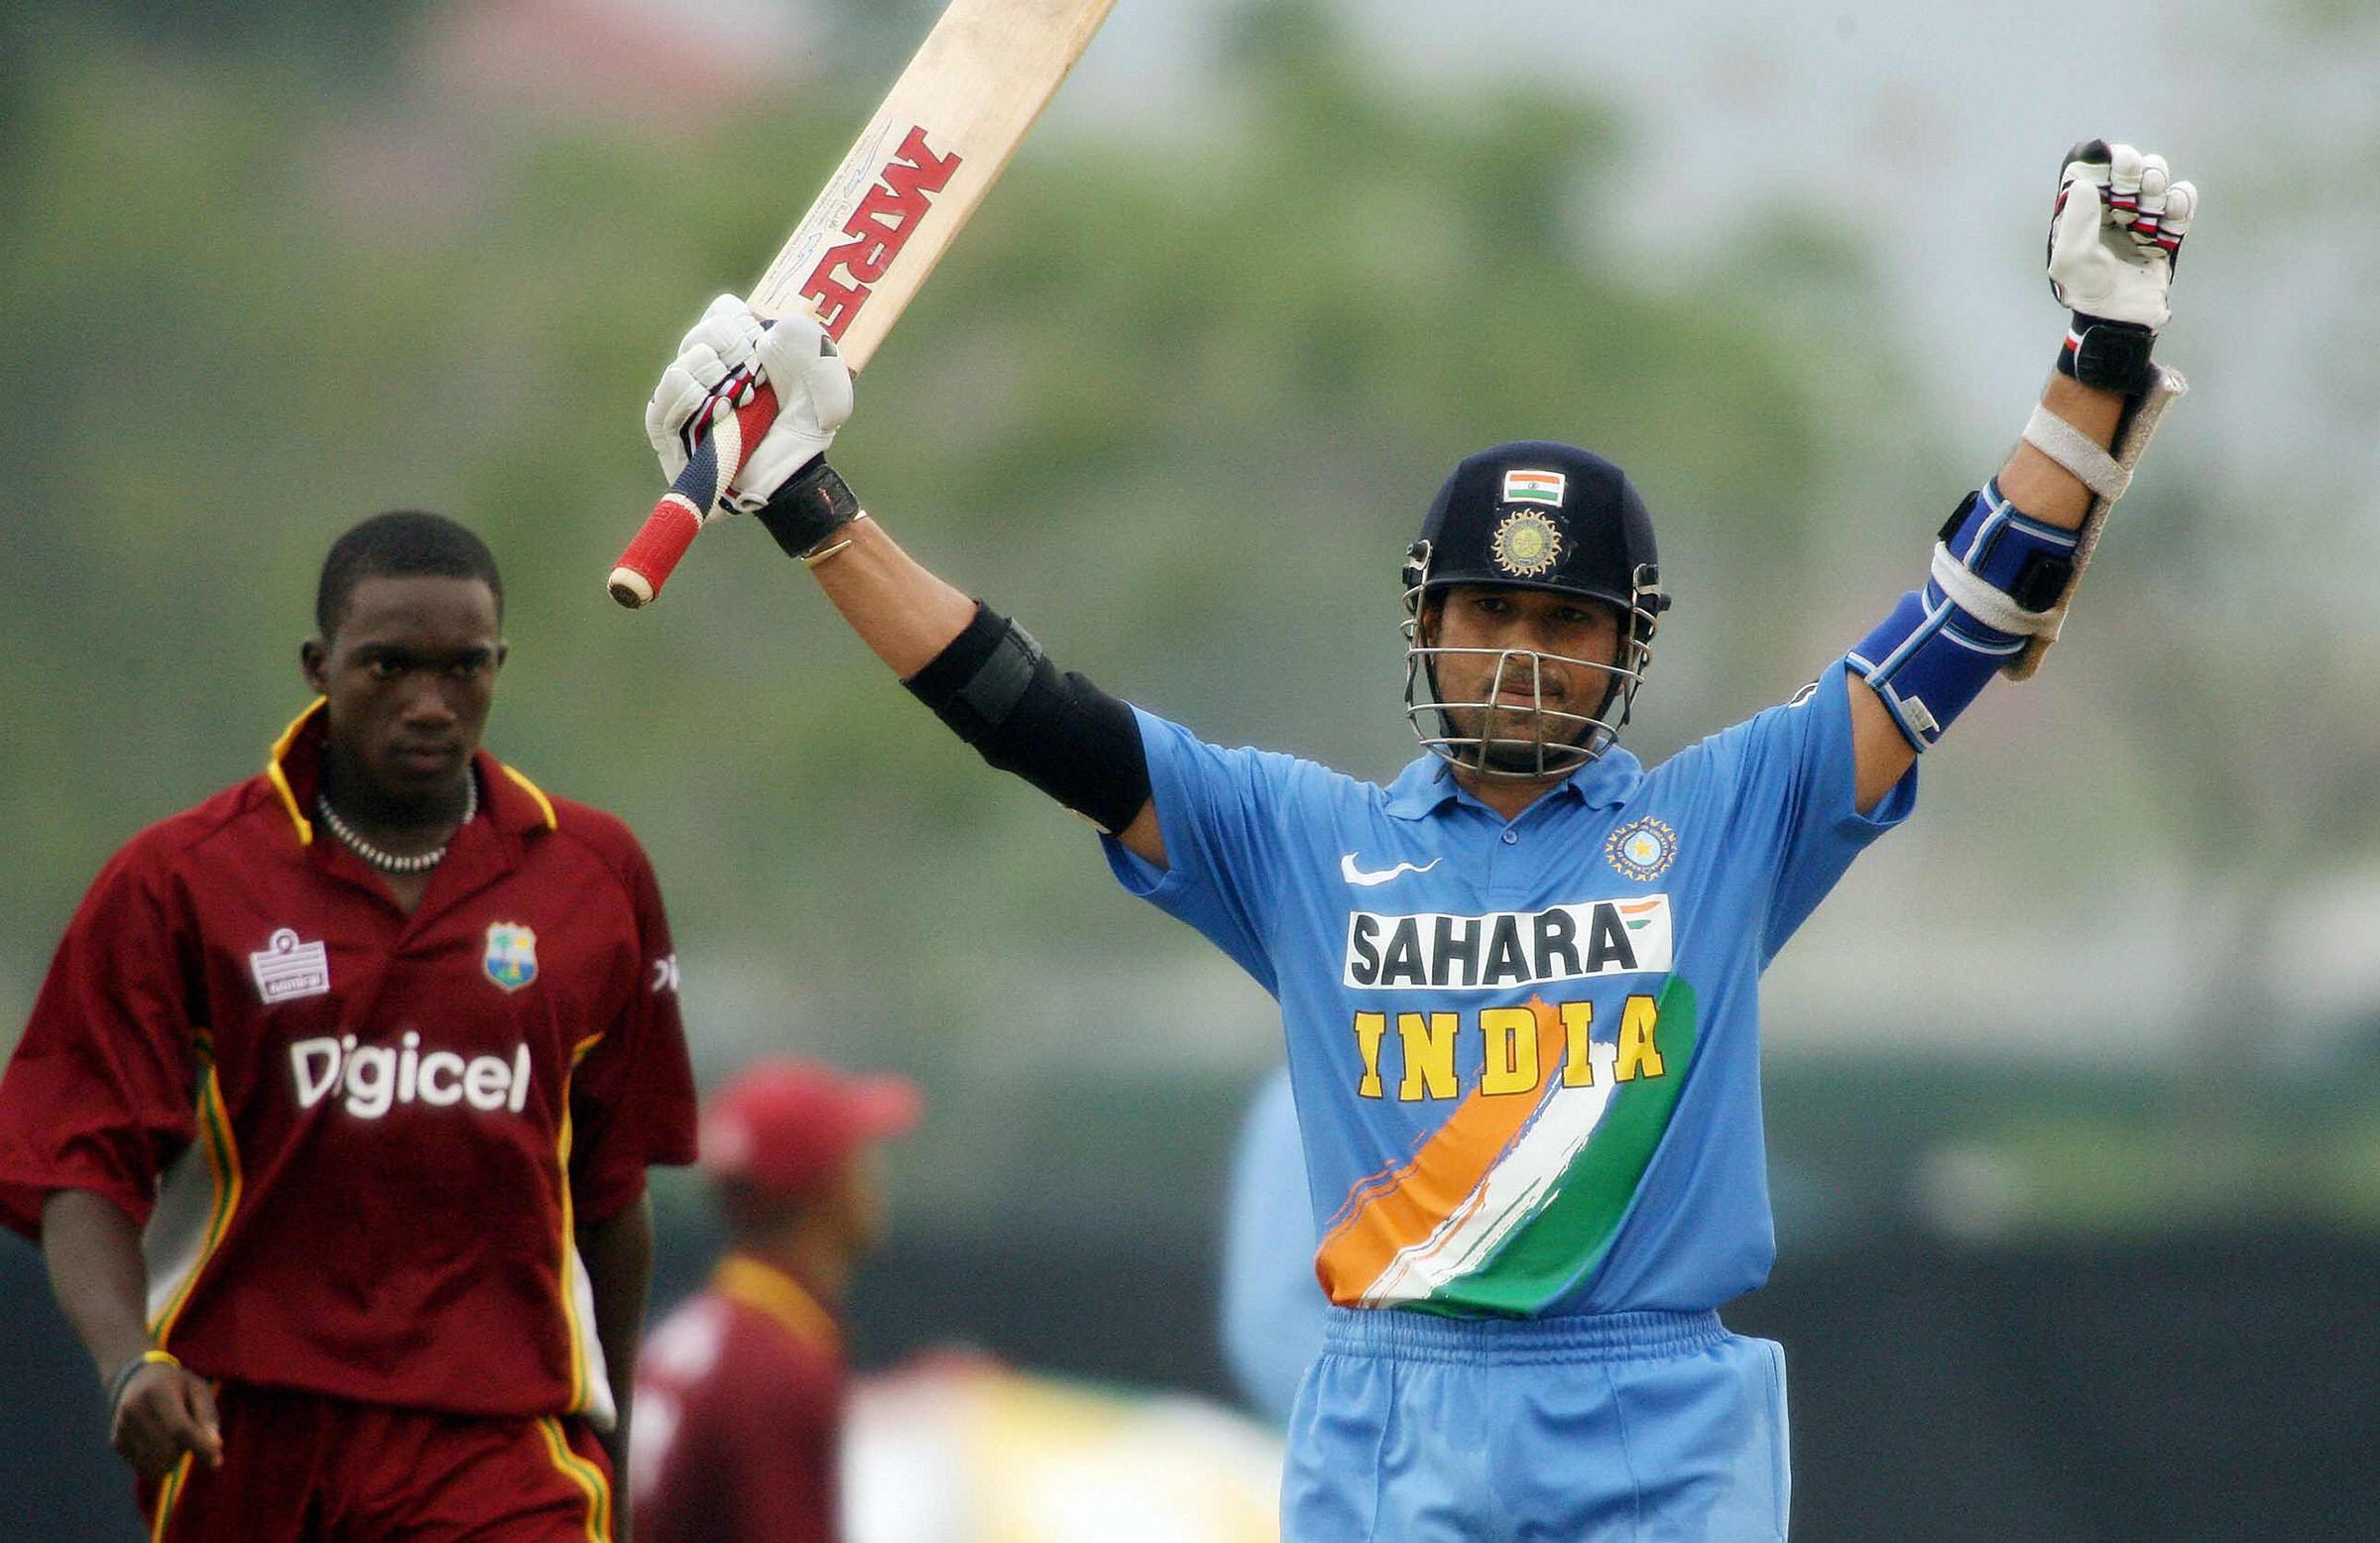 Sachin Tendulkar celebrates a hundred in the 2006 DLF Cup // Getty